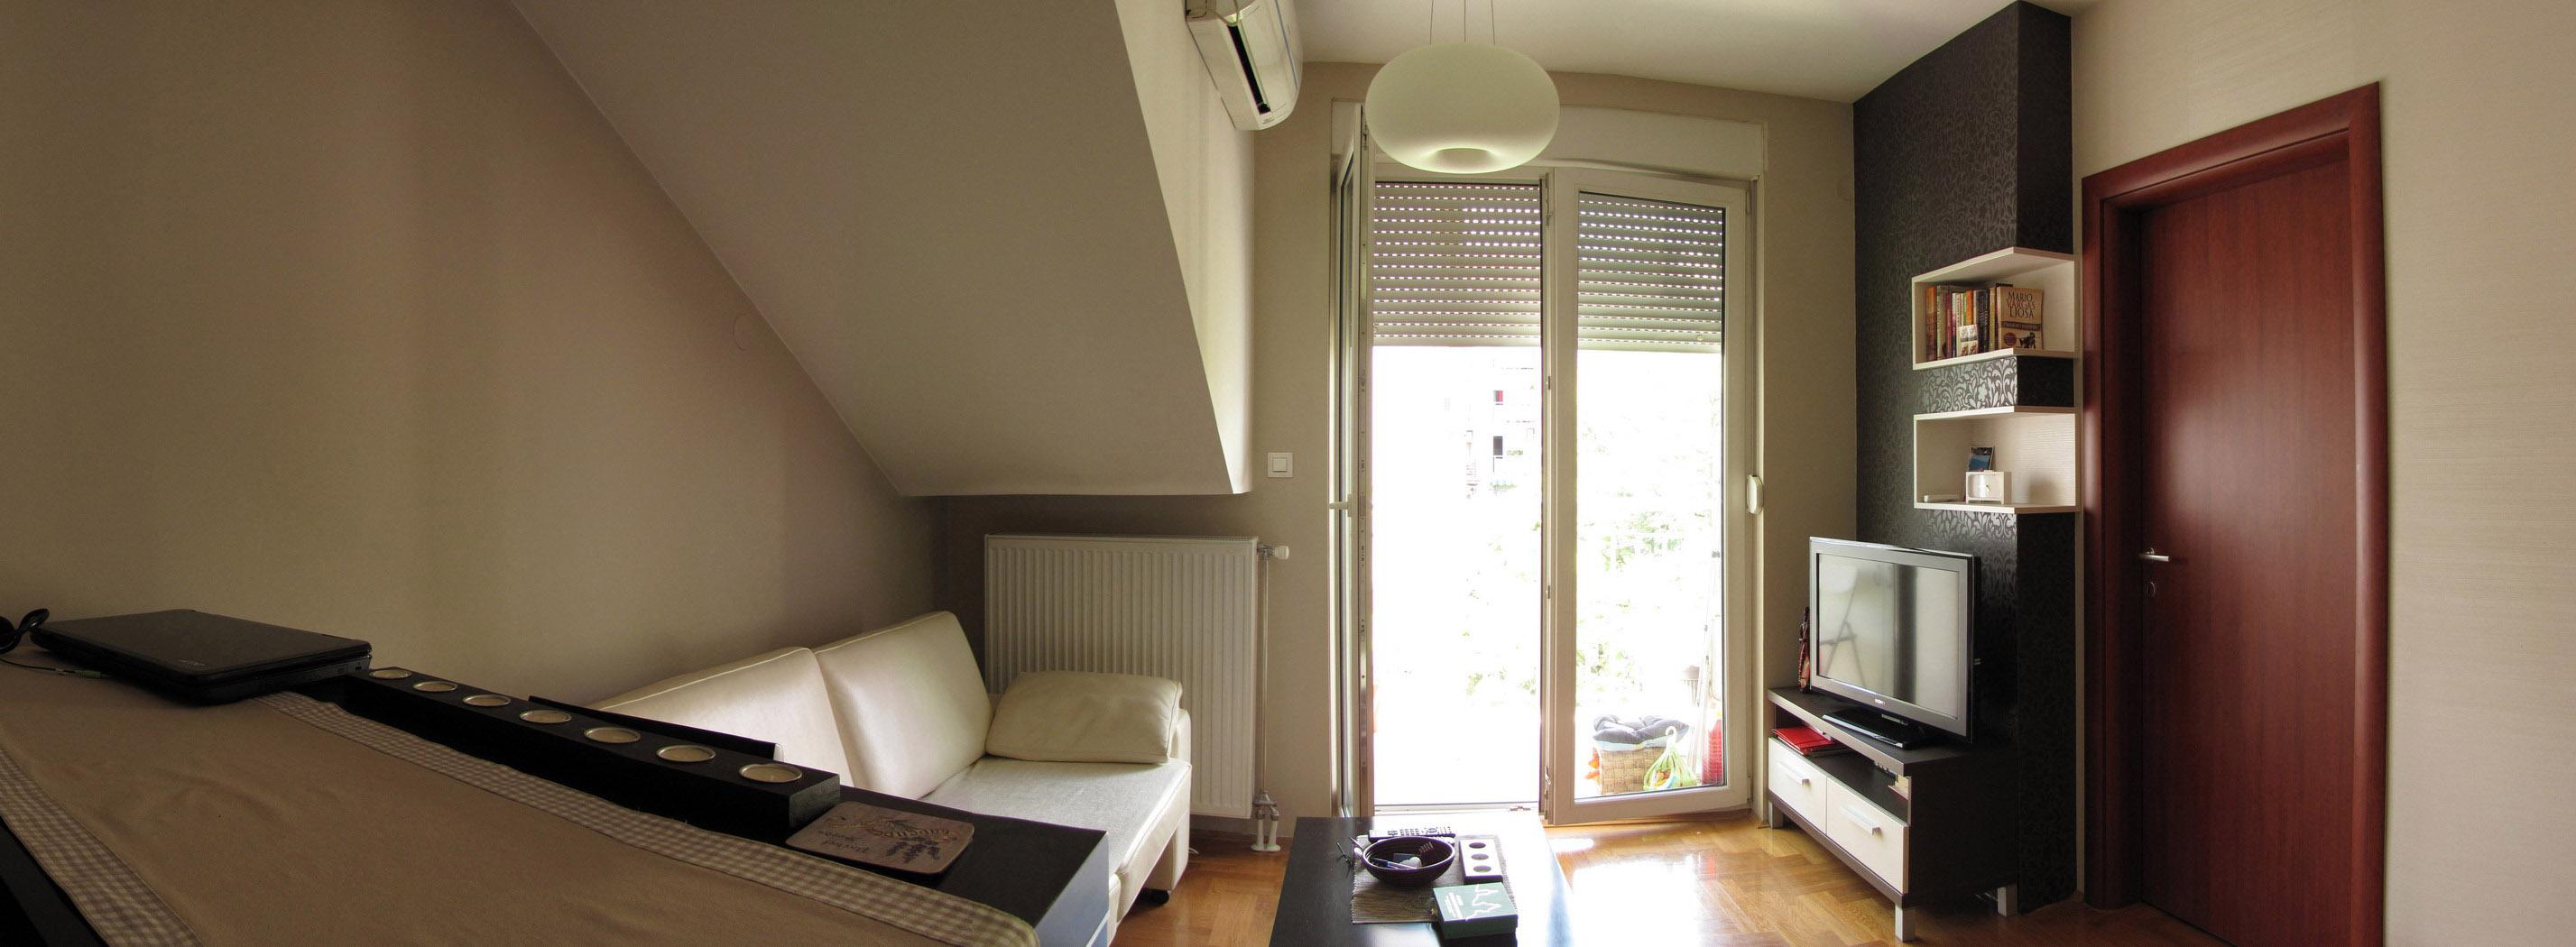 0033_LIVING ROOM